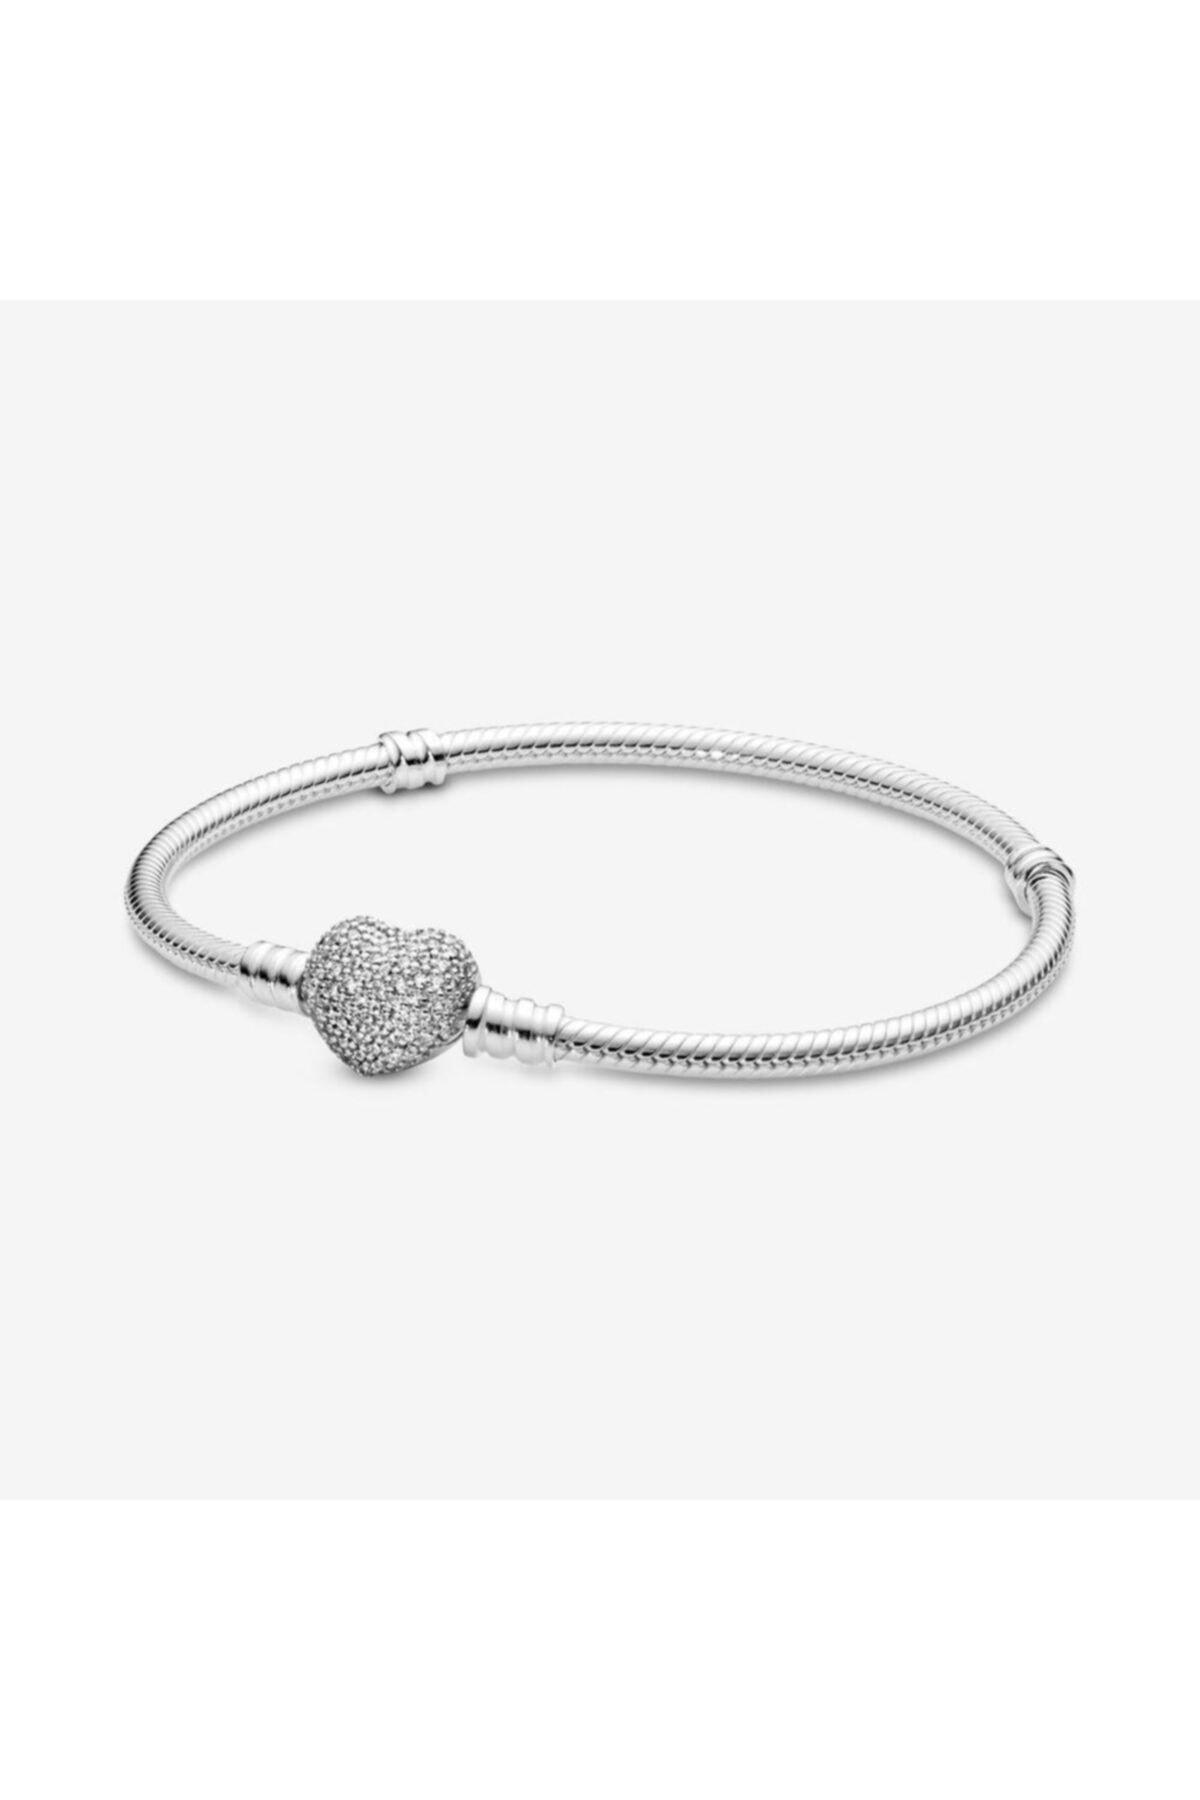 My Story Pandora Charm Uyumlu Pave Taşlı Kalp Gümüş Bileklik 1